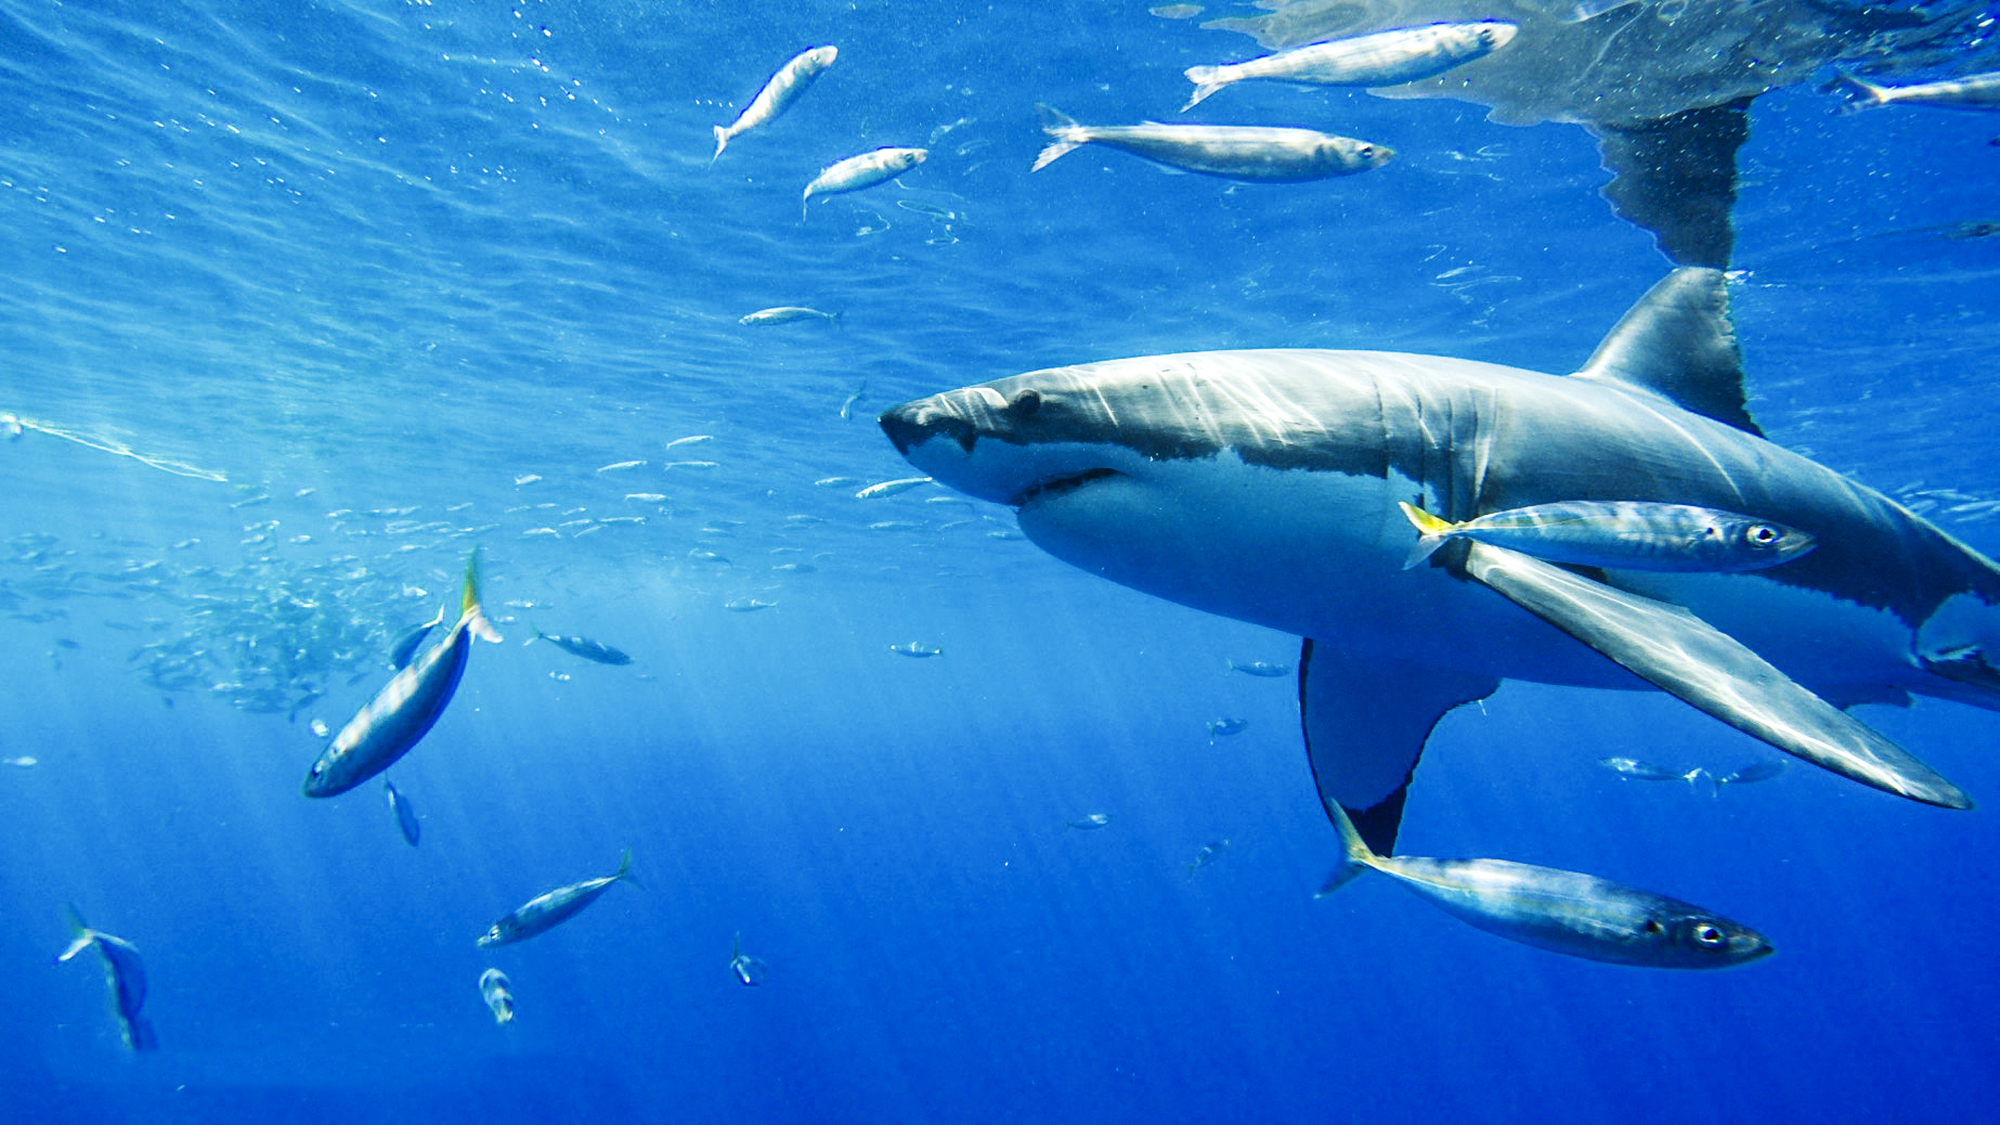 A whitye shark, photo by Louisa Kierman